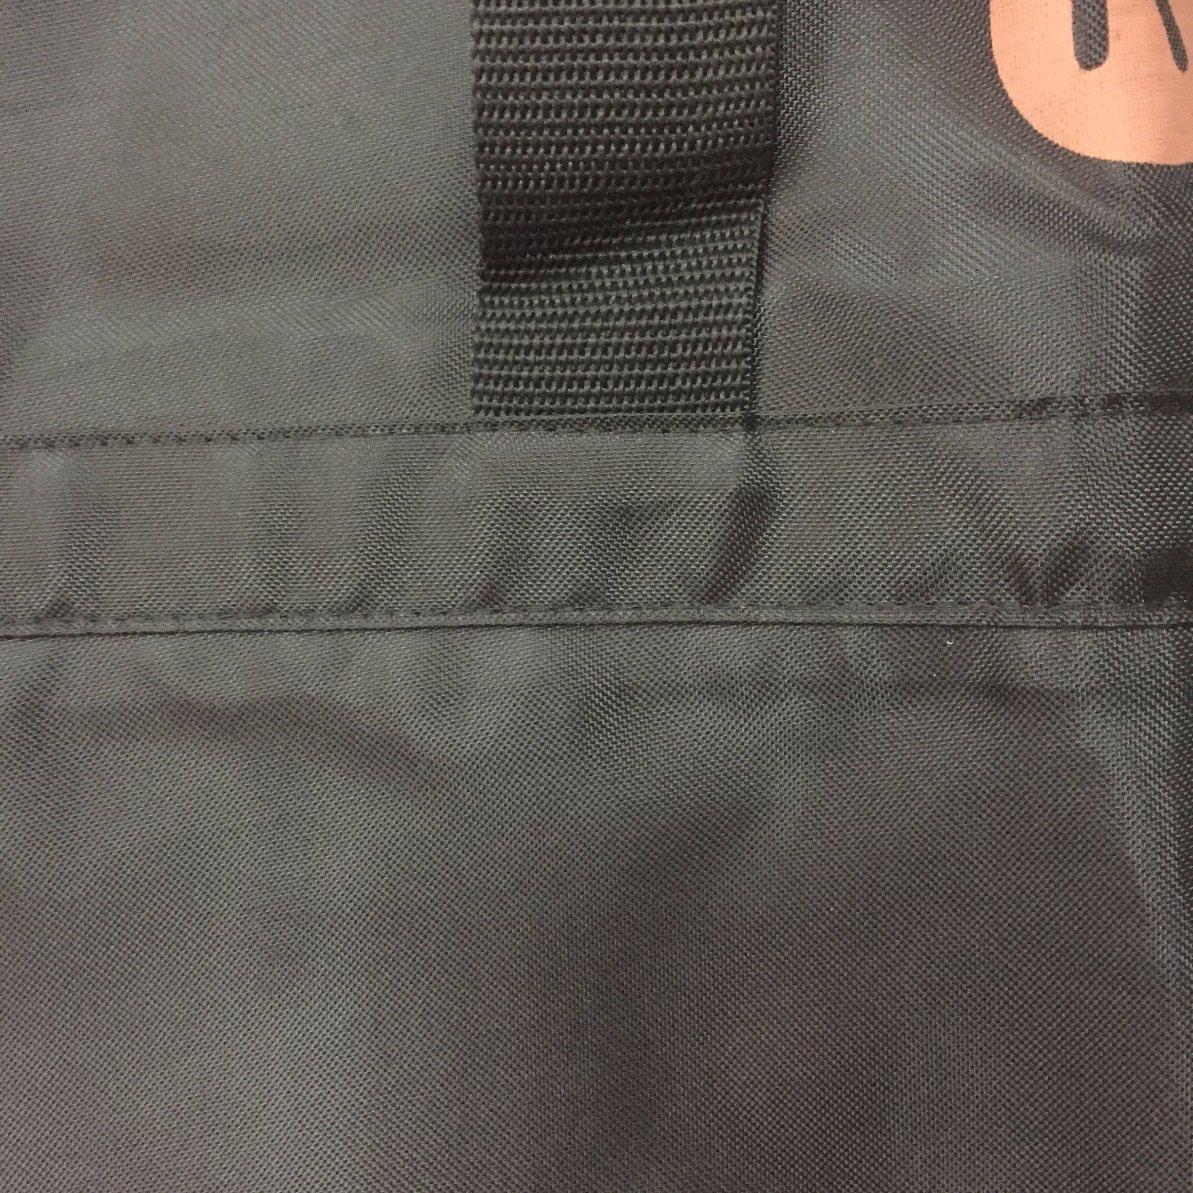 Custom PEVA Clothes Cover Suit Garment Bag with Transparent Window